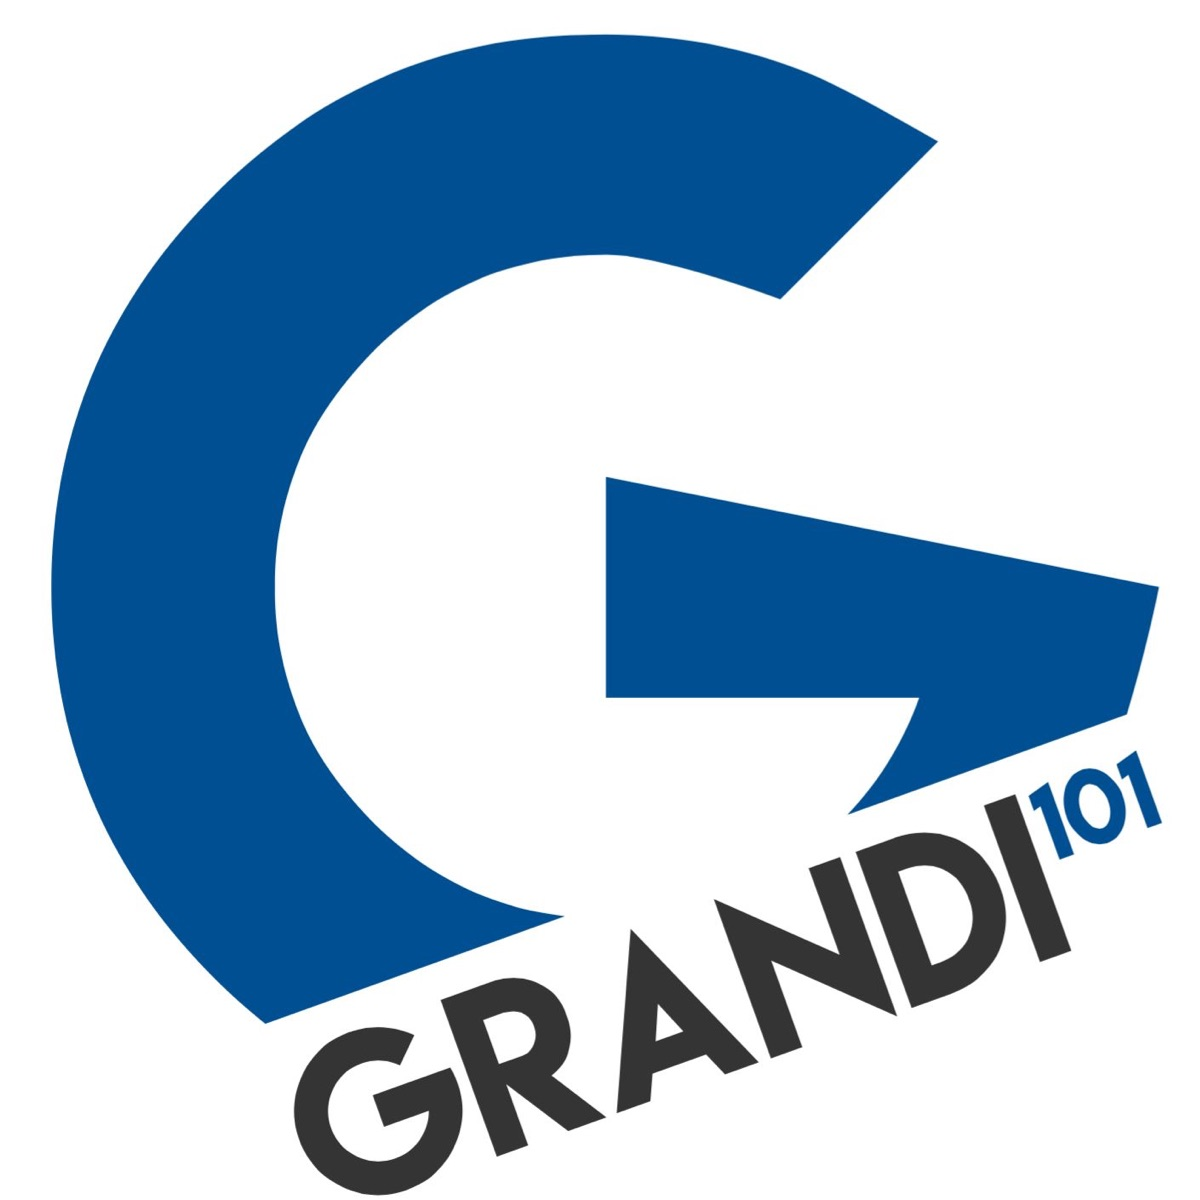 Grandi101